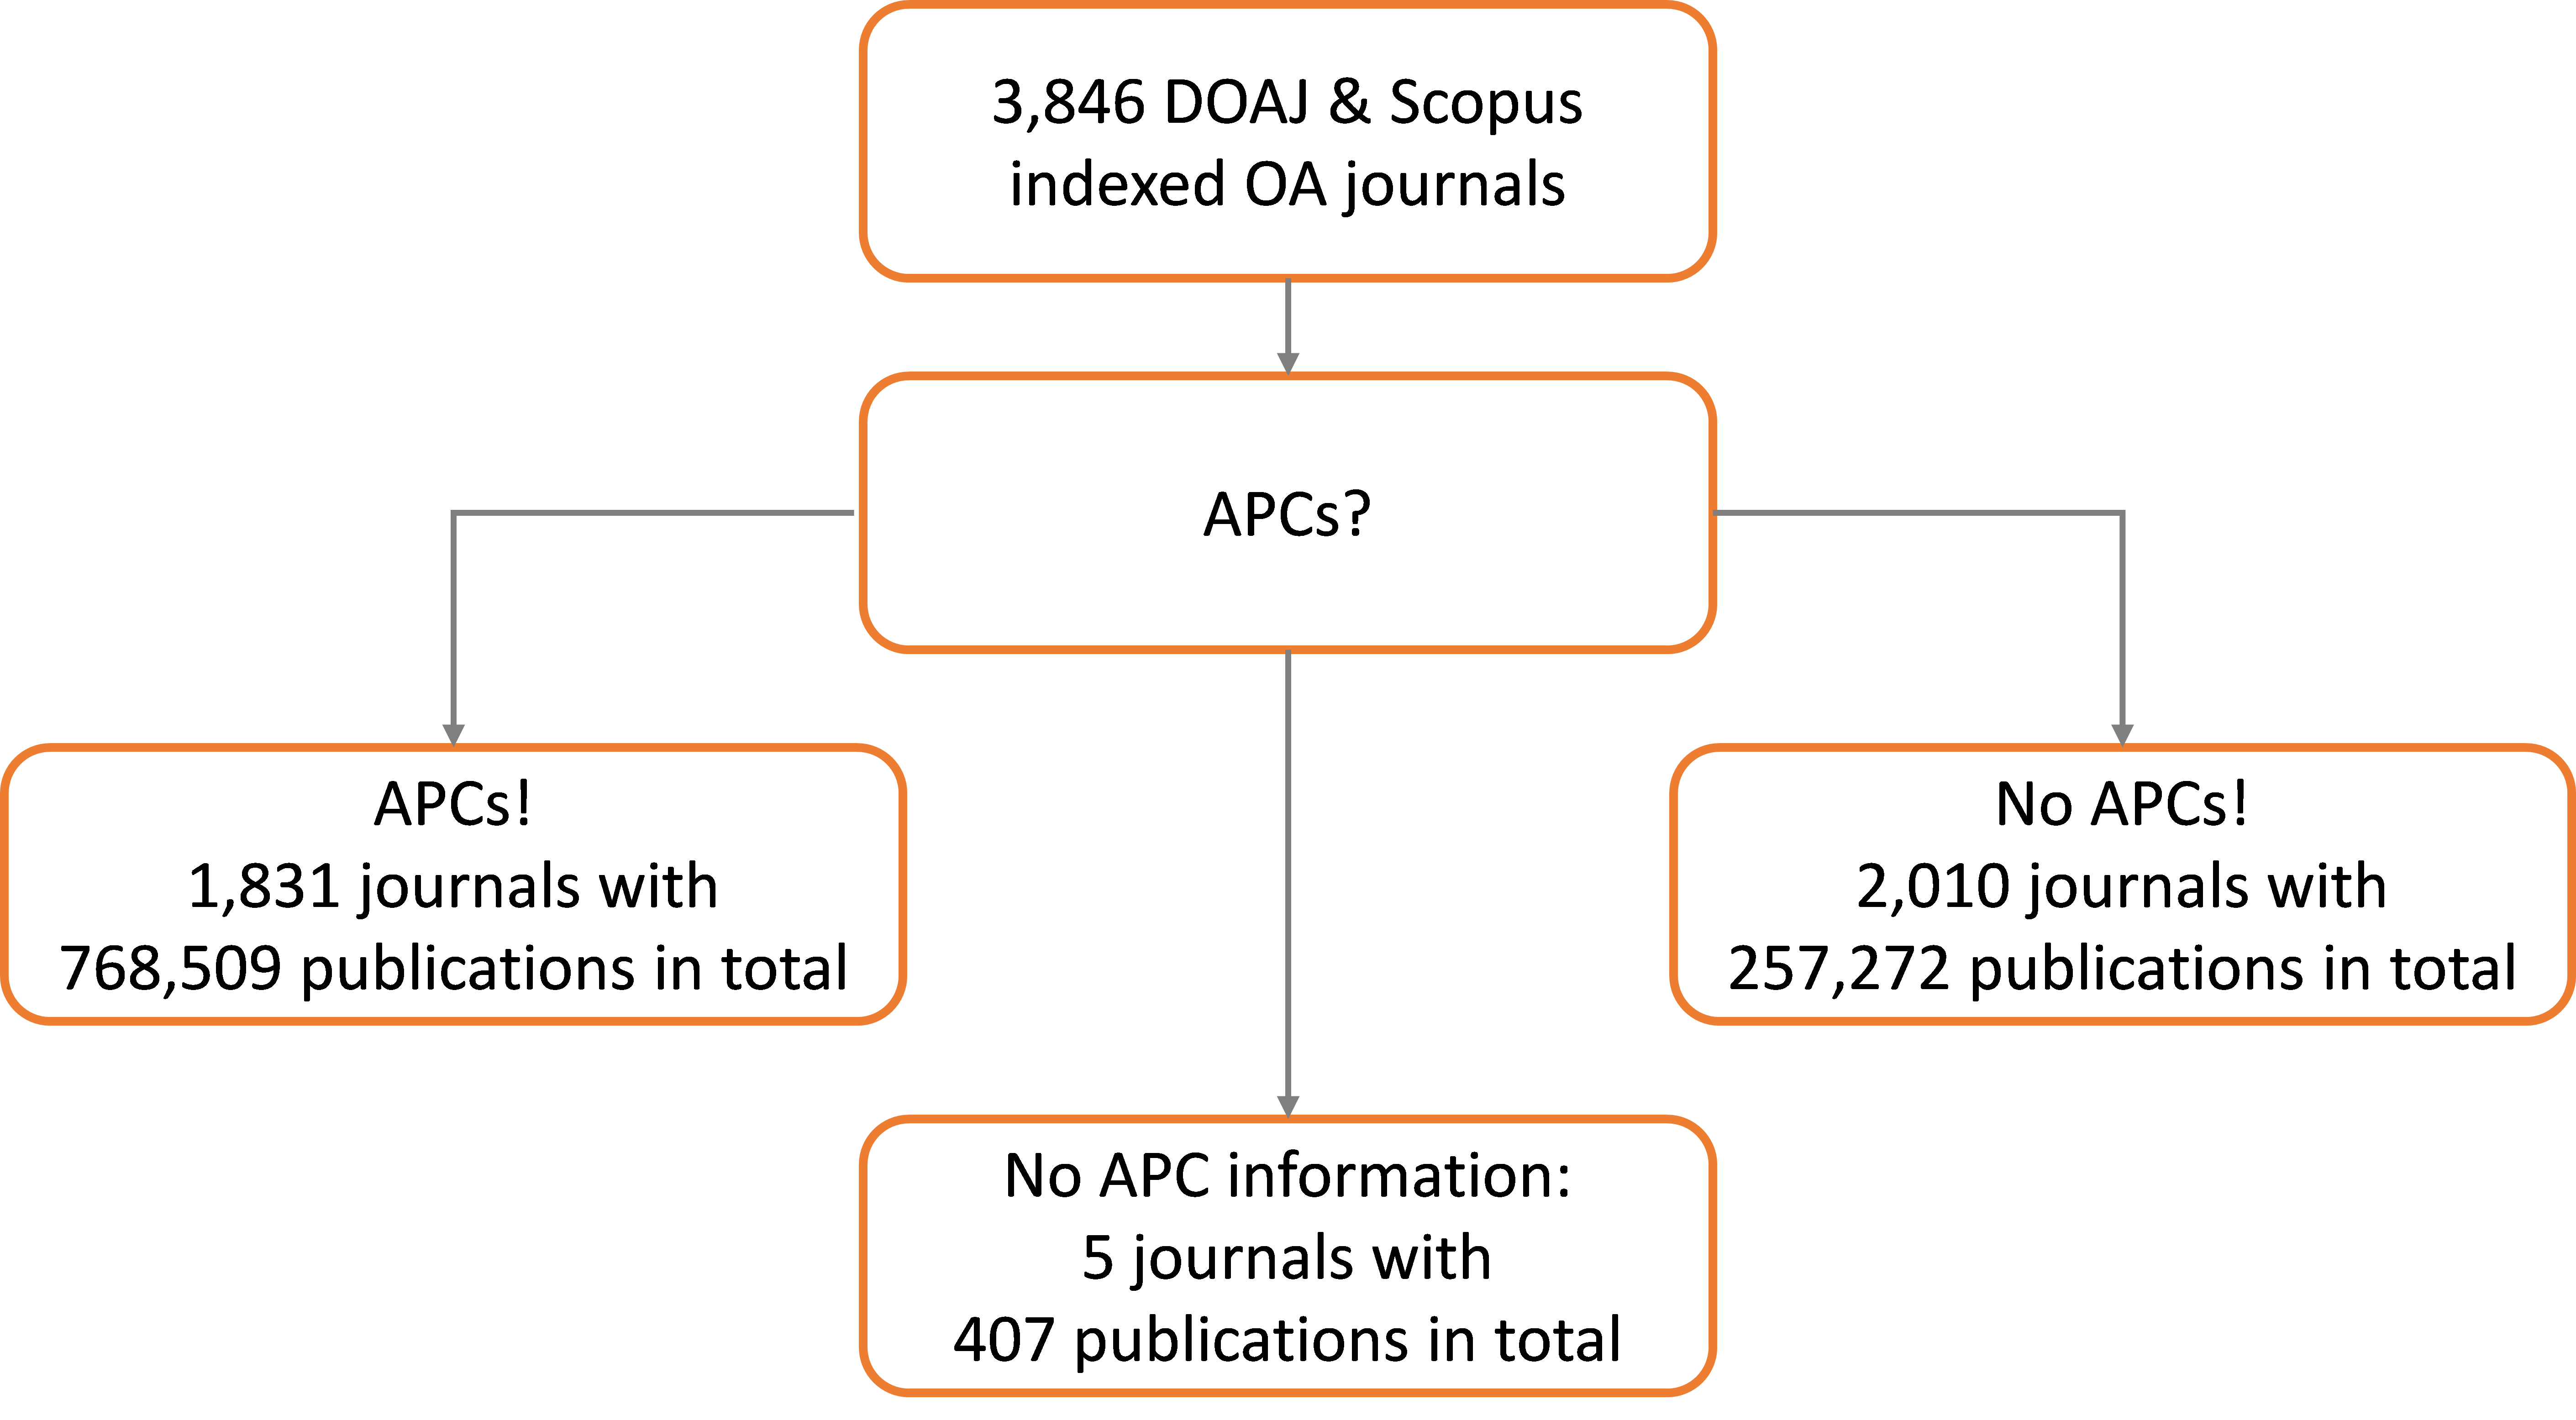 files/assets/images/Abbildung zum Blogbeitrag APCs das dominierende Geschäftsmodell englisch.png